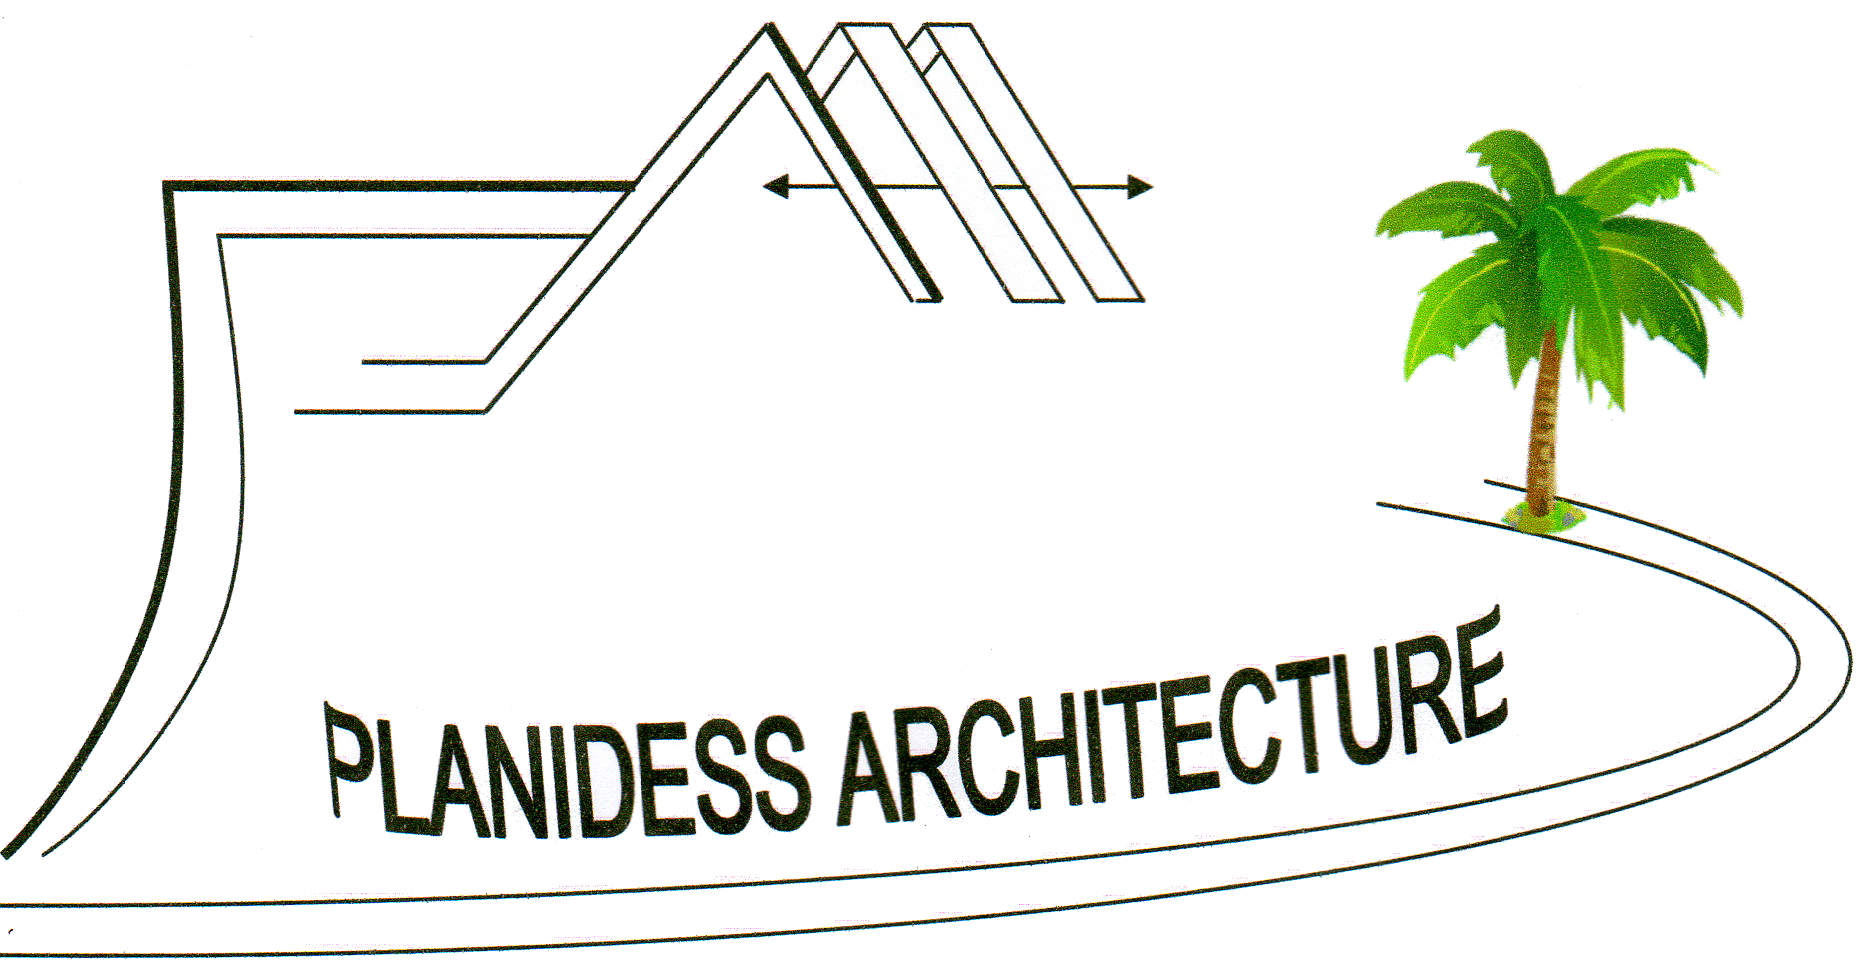 Planidess Architecture